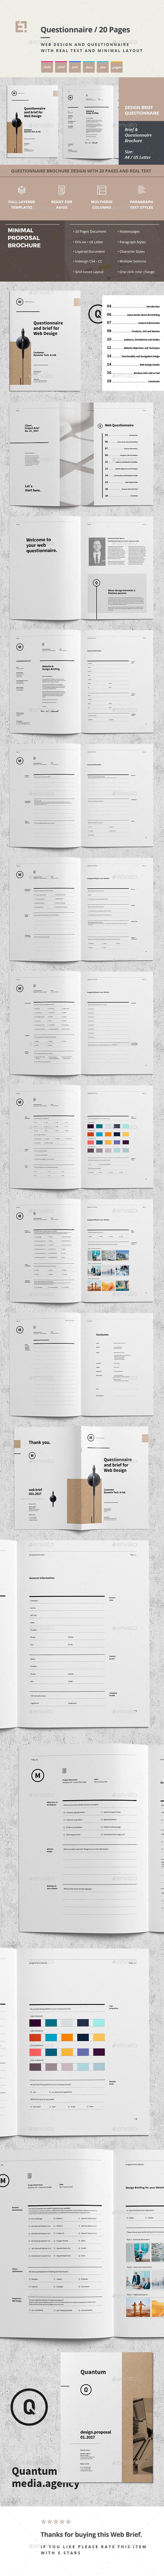 Questionnaire Web Design - Informational Brochures